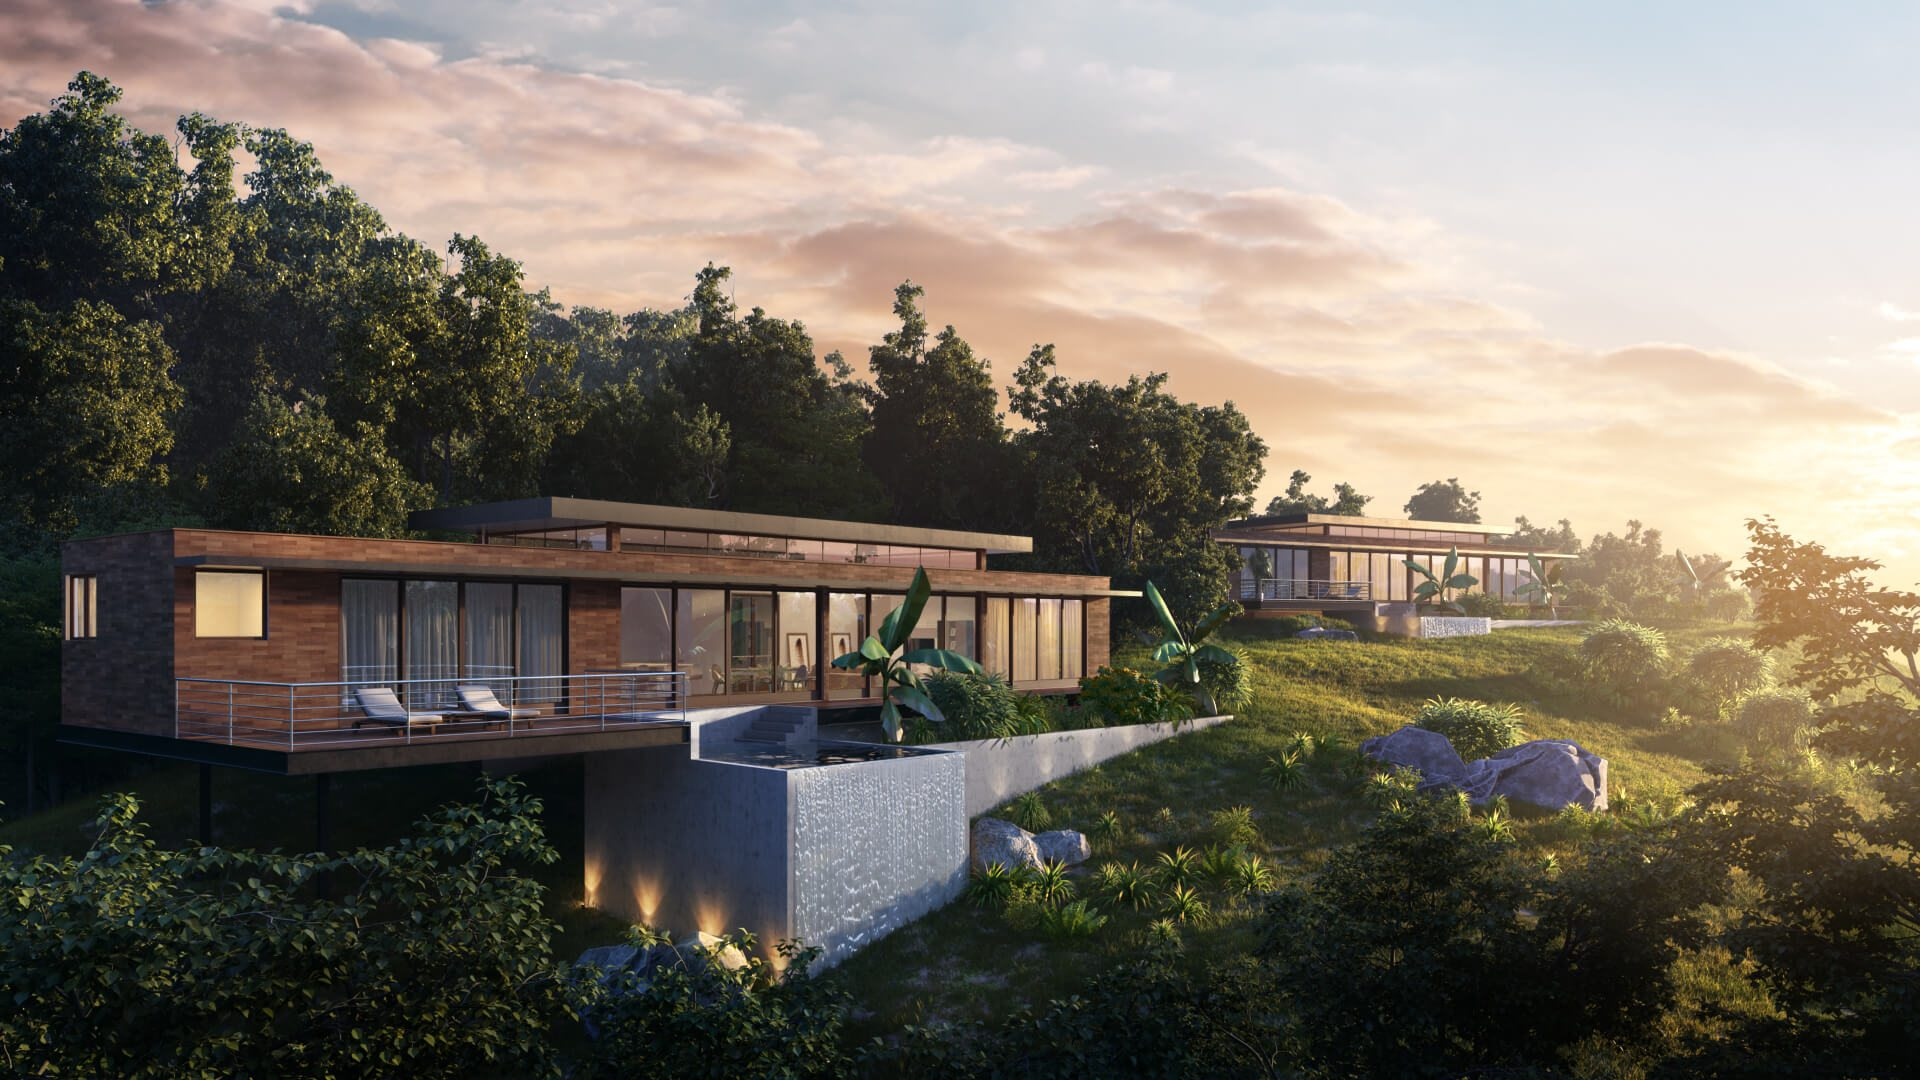 Aerial 3D Rendering of a Tropical Resort Hotel